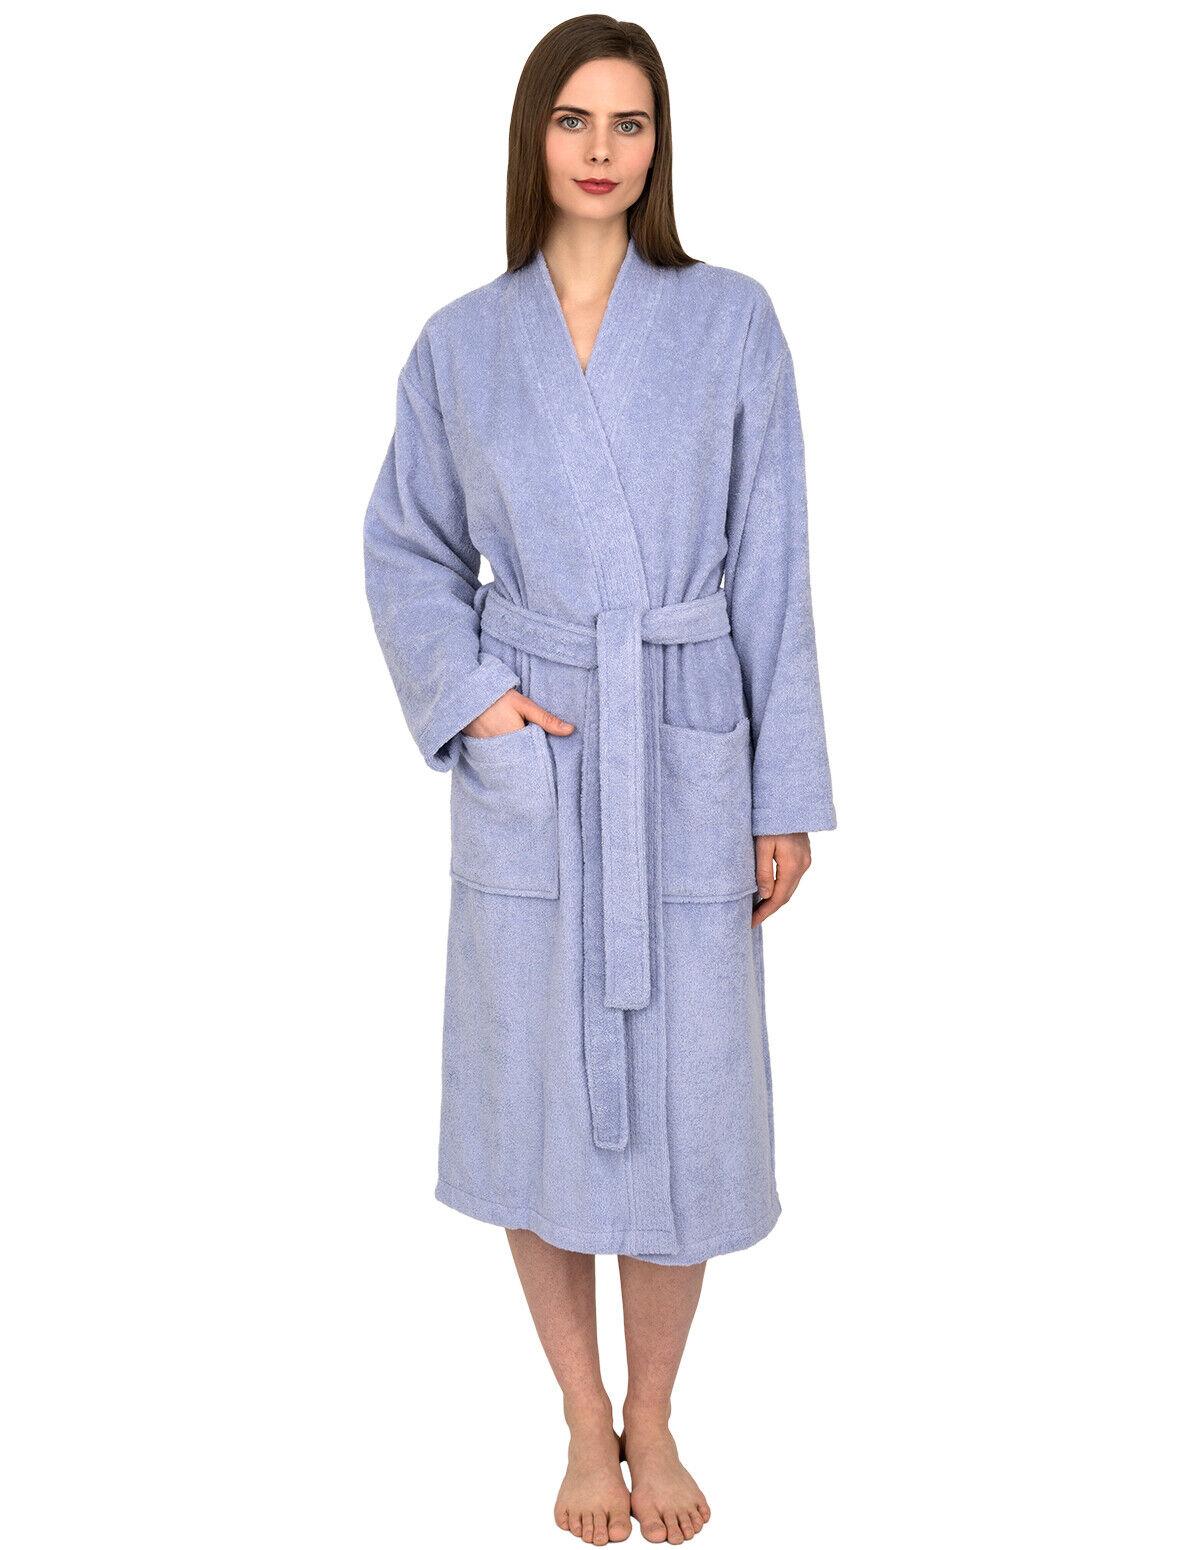 TowelSelections Women's Robe, Low Twist Cotton Terry Bathrobe